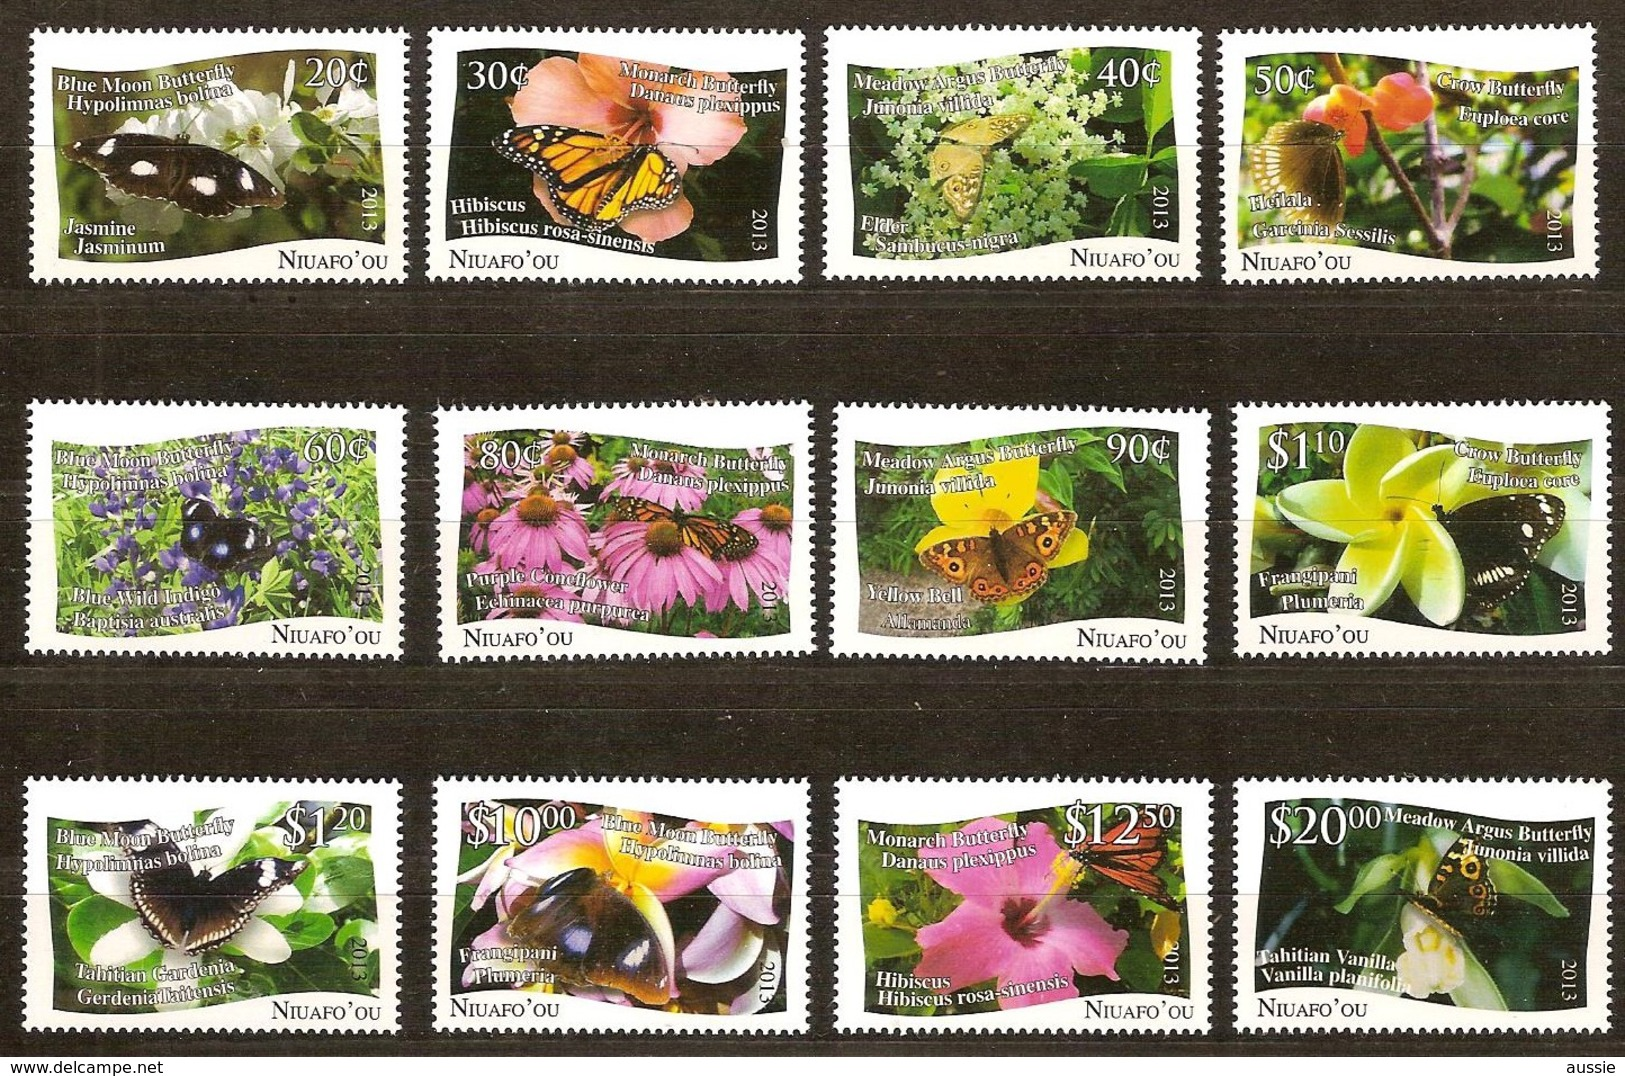 Tonga Niuafo'ou 2013 Yvertn° 368-379 *** MNH Cote 95 Euro Faune Flore Papillons Vlinders Fleurs Bloemen - Tonga (1970-...)